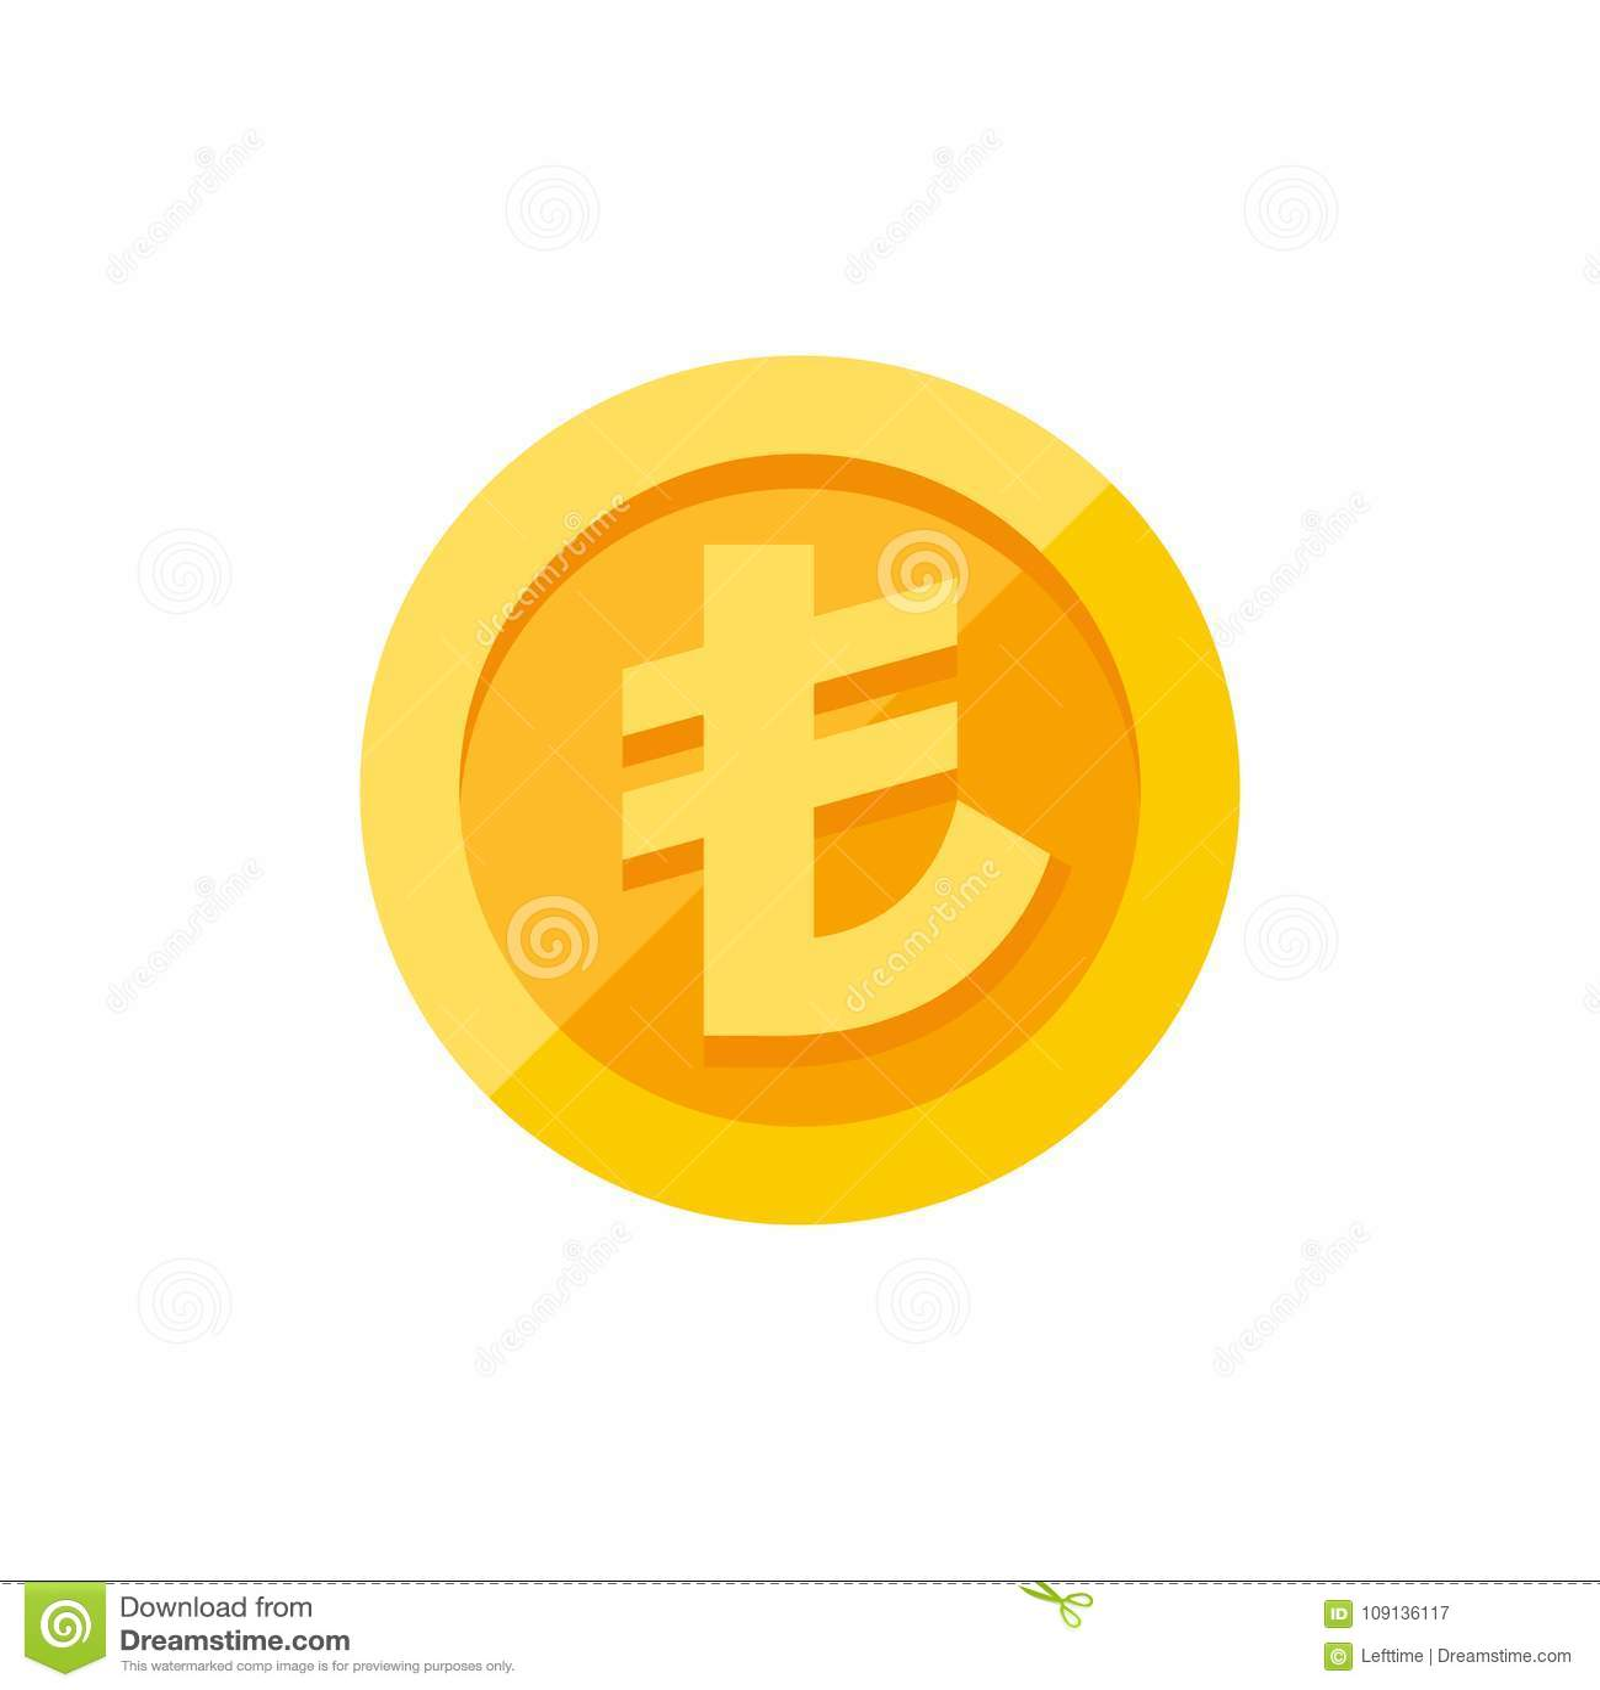 Turkey currency symbol images symbol and sign ideas turkish currency symbol images symbol and sign ideas turkish lira currency symbol on gold coin flat buycottarizona